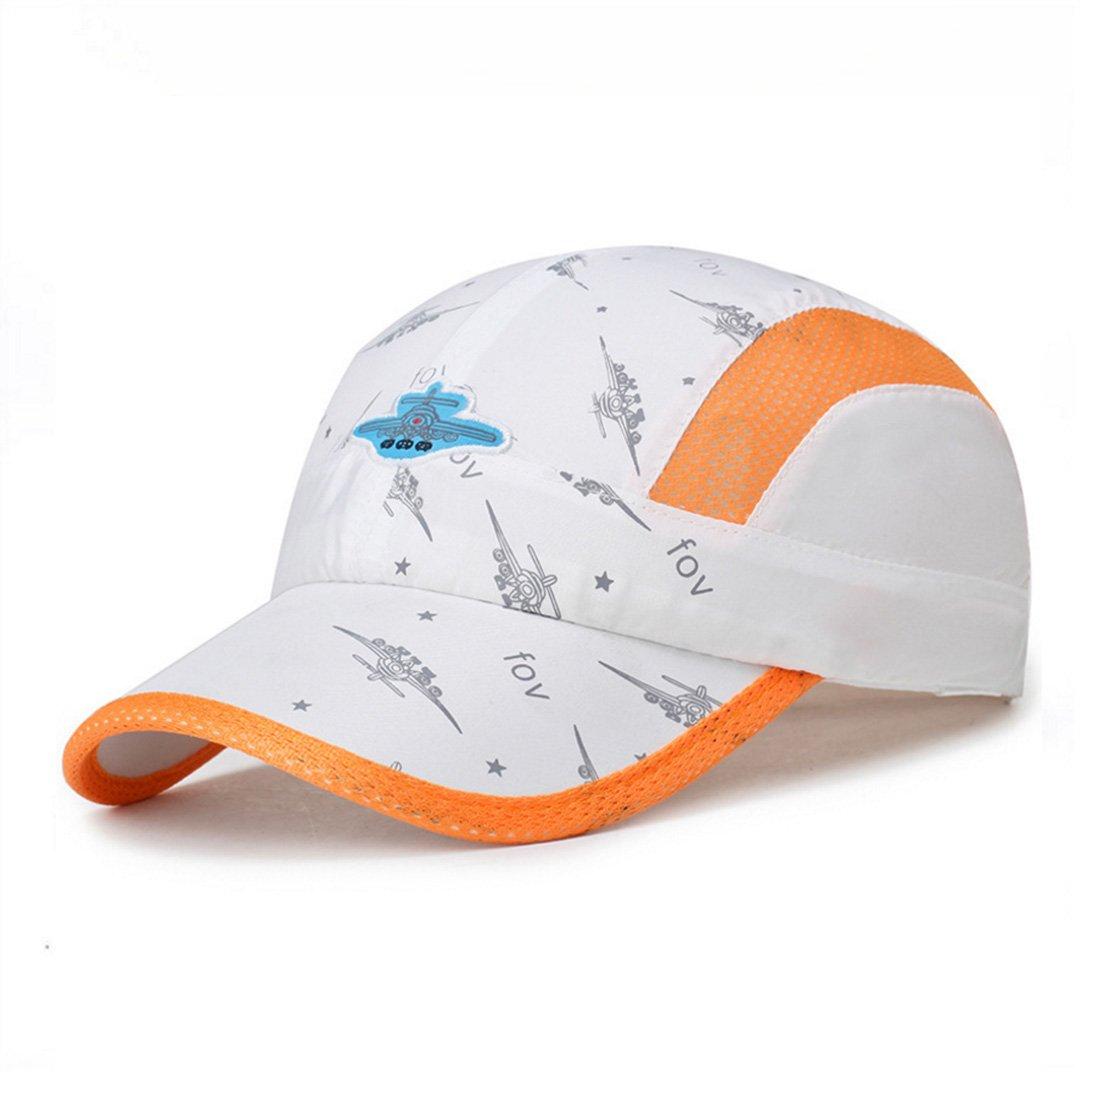 Eleganty Kids Quick Drying Sun Hat, Adjustable Airy Mesh UV Protection Baseball Caps